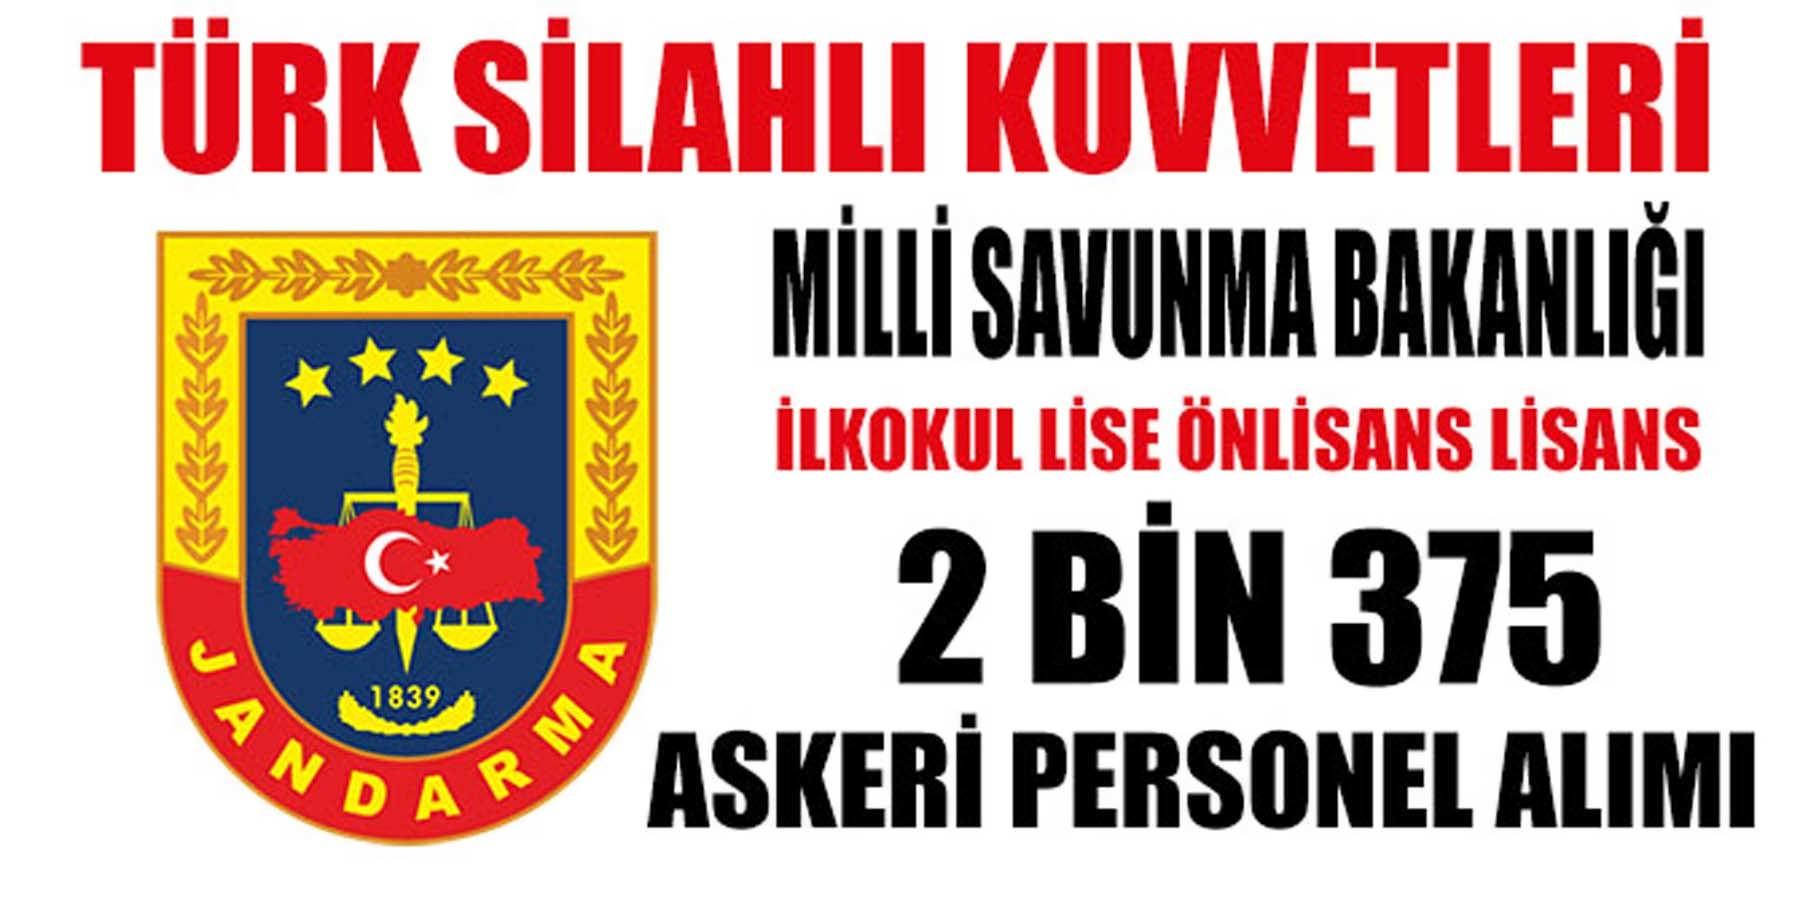 TSK MSB Jandarma 2 Bin 375 Askeri Personel Alım Başvurusu